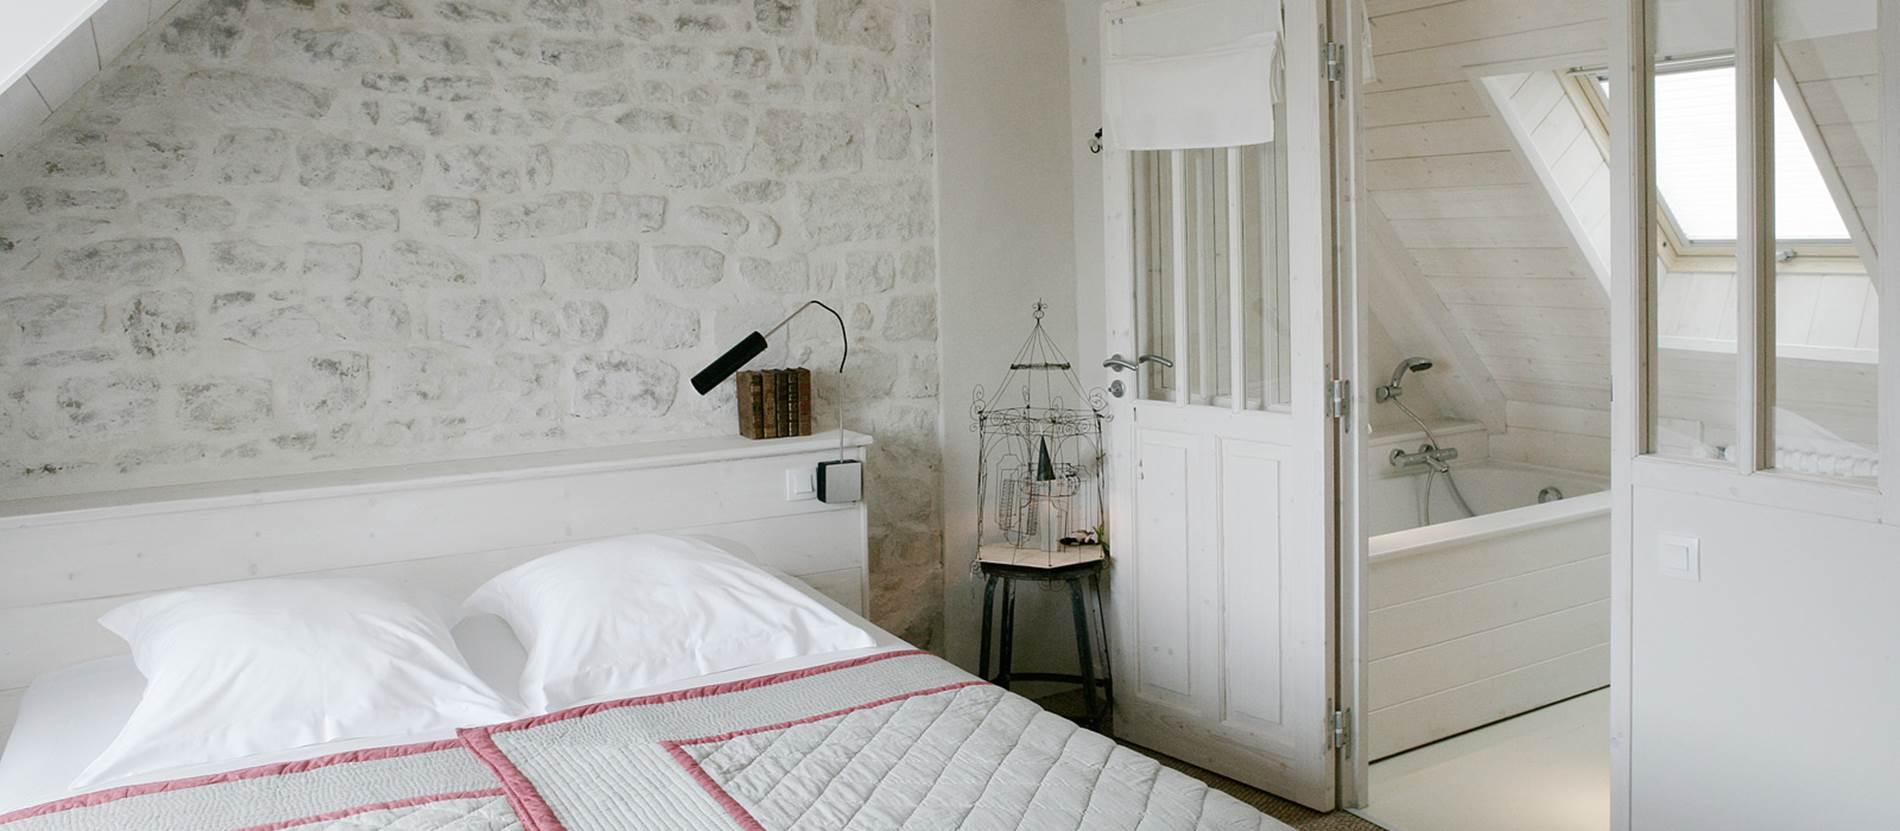 Hôtel Le Lodge Kerisper - LA TRINITE SUR MER - Morbihan Bretagne Sud ©